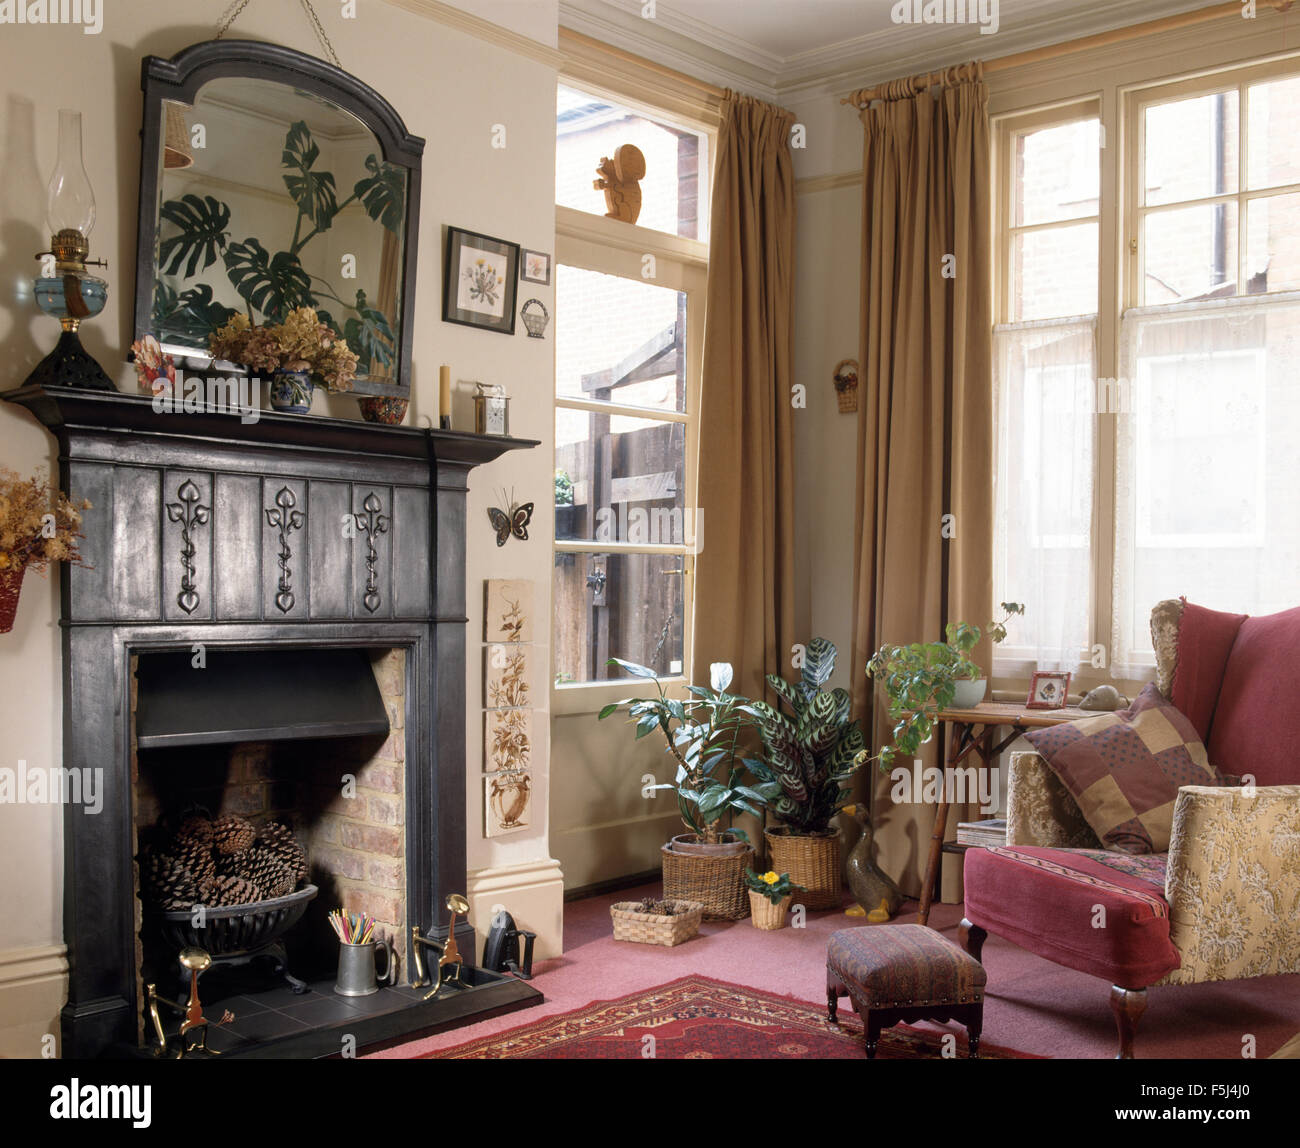 Original Cast Iron Edwardian Fireplace In A Seventies